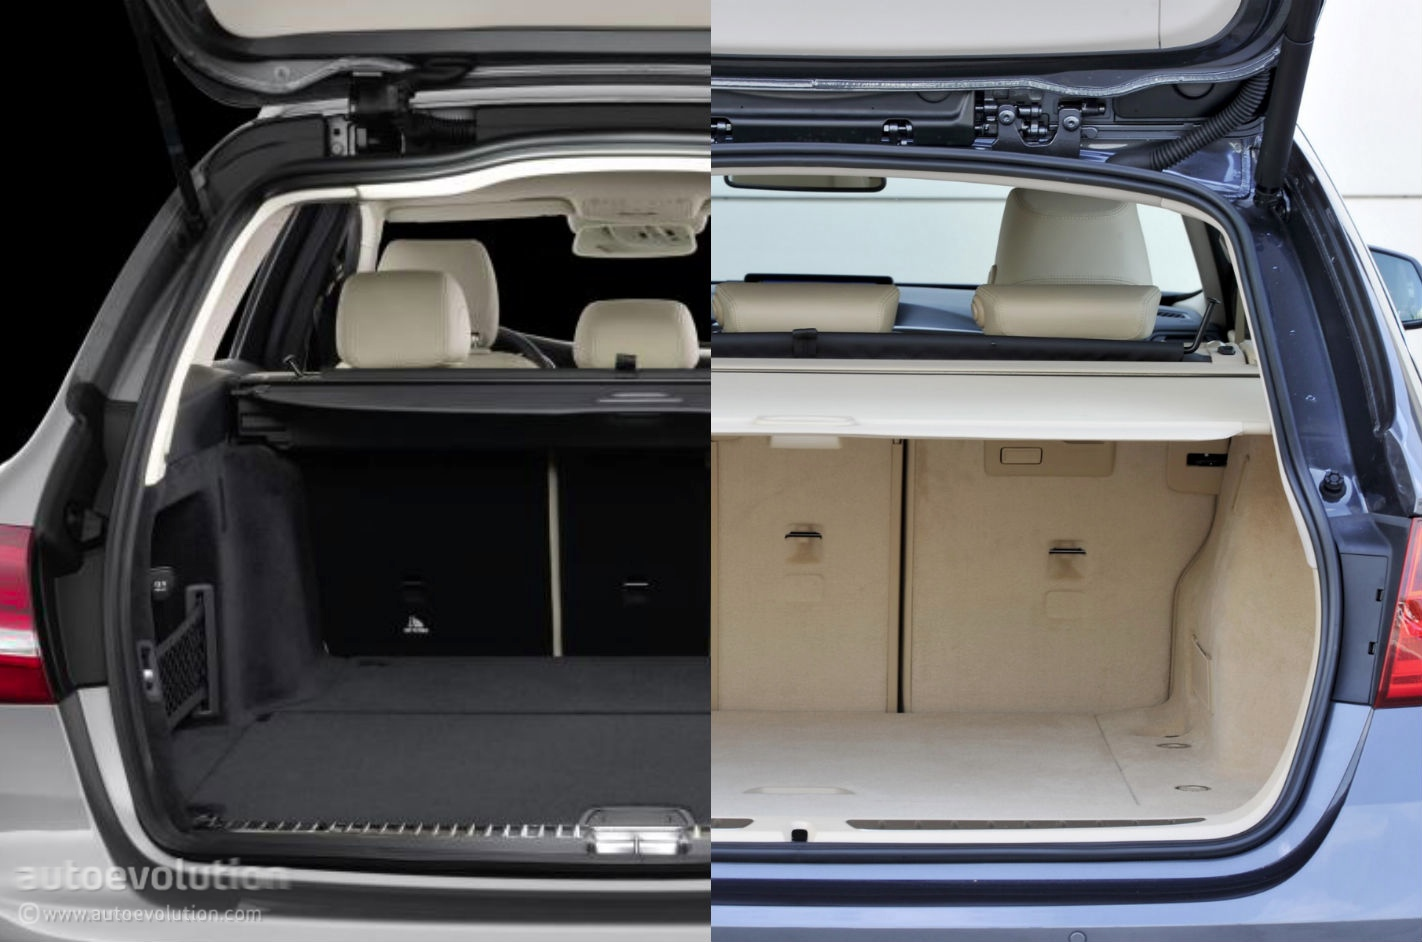 Worksheet. MercedesBenz CClass Estate S205 vs BMW 3 Series Touring F31